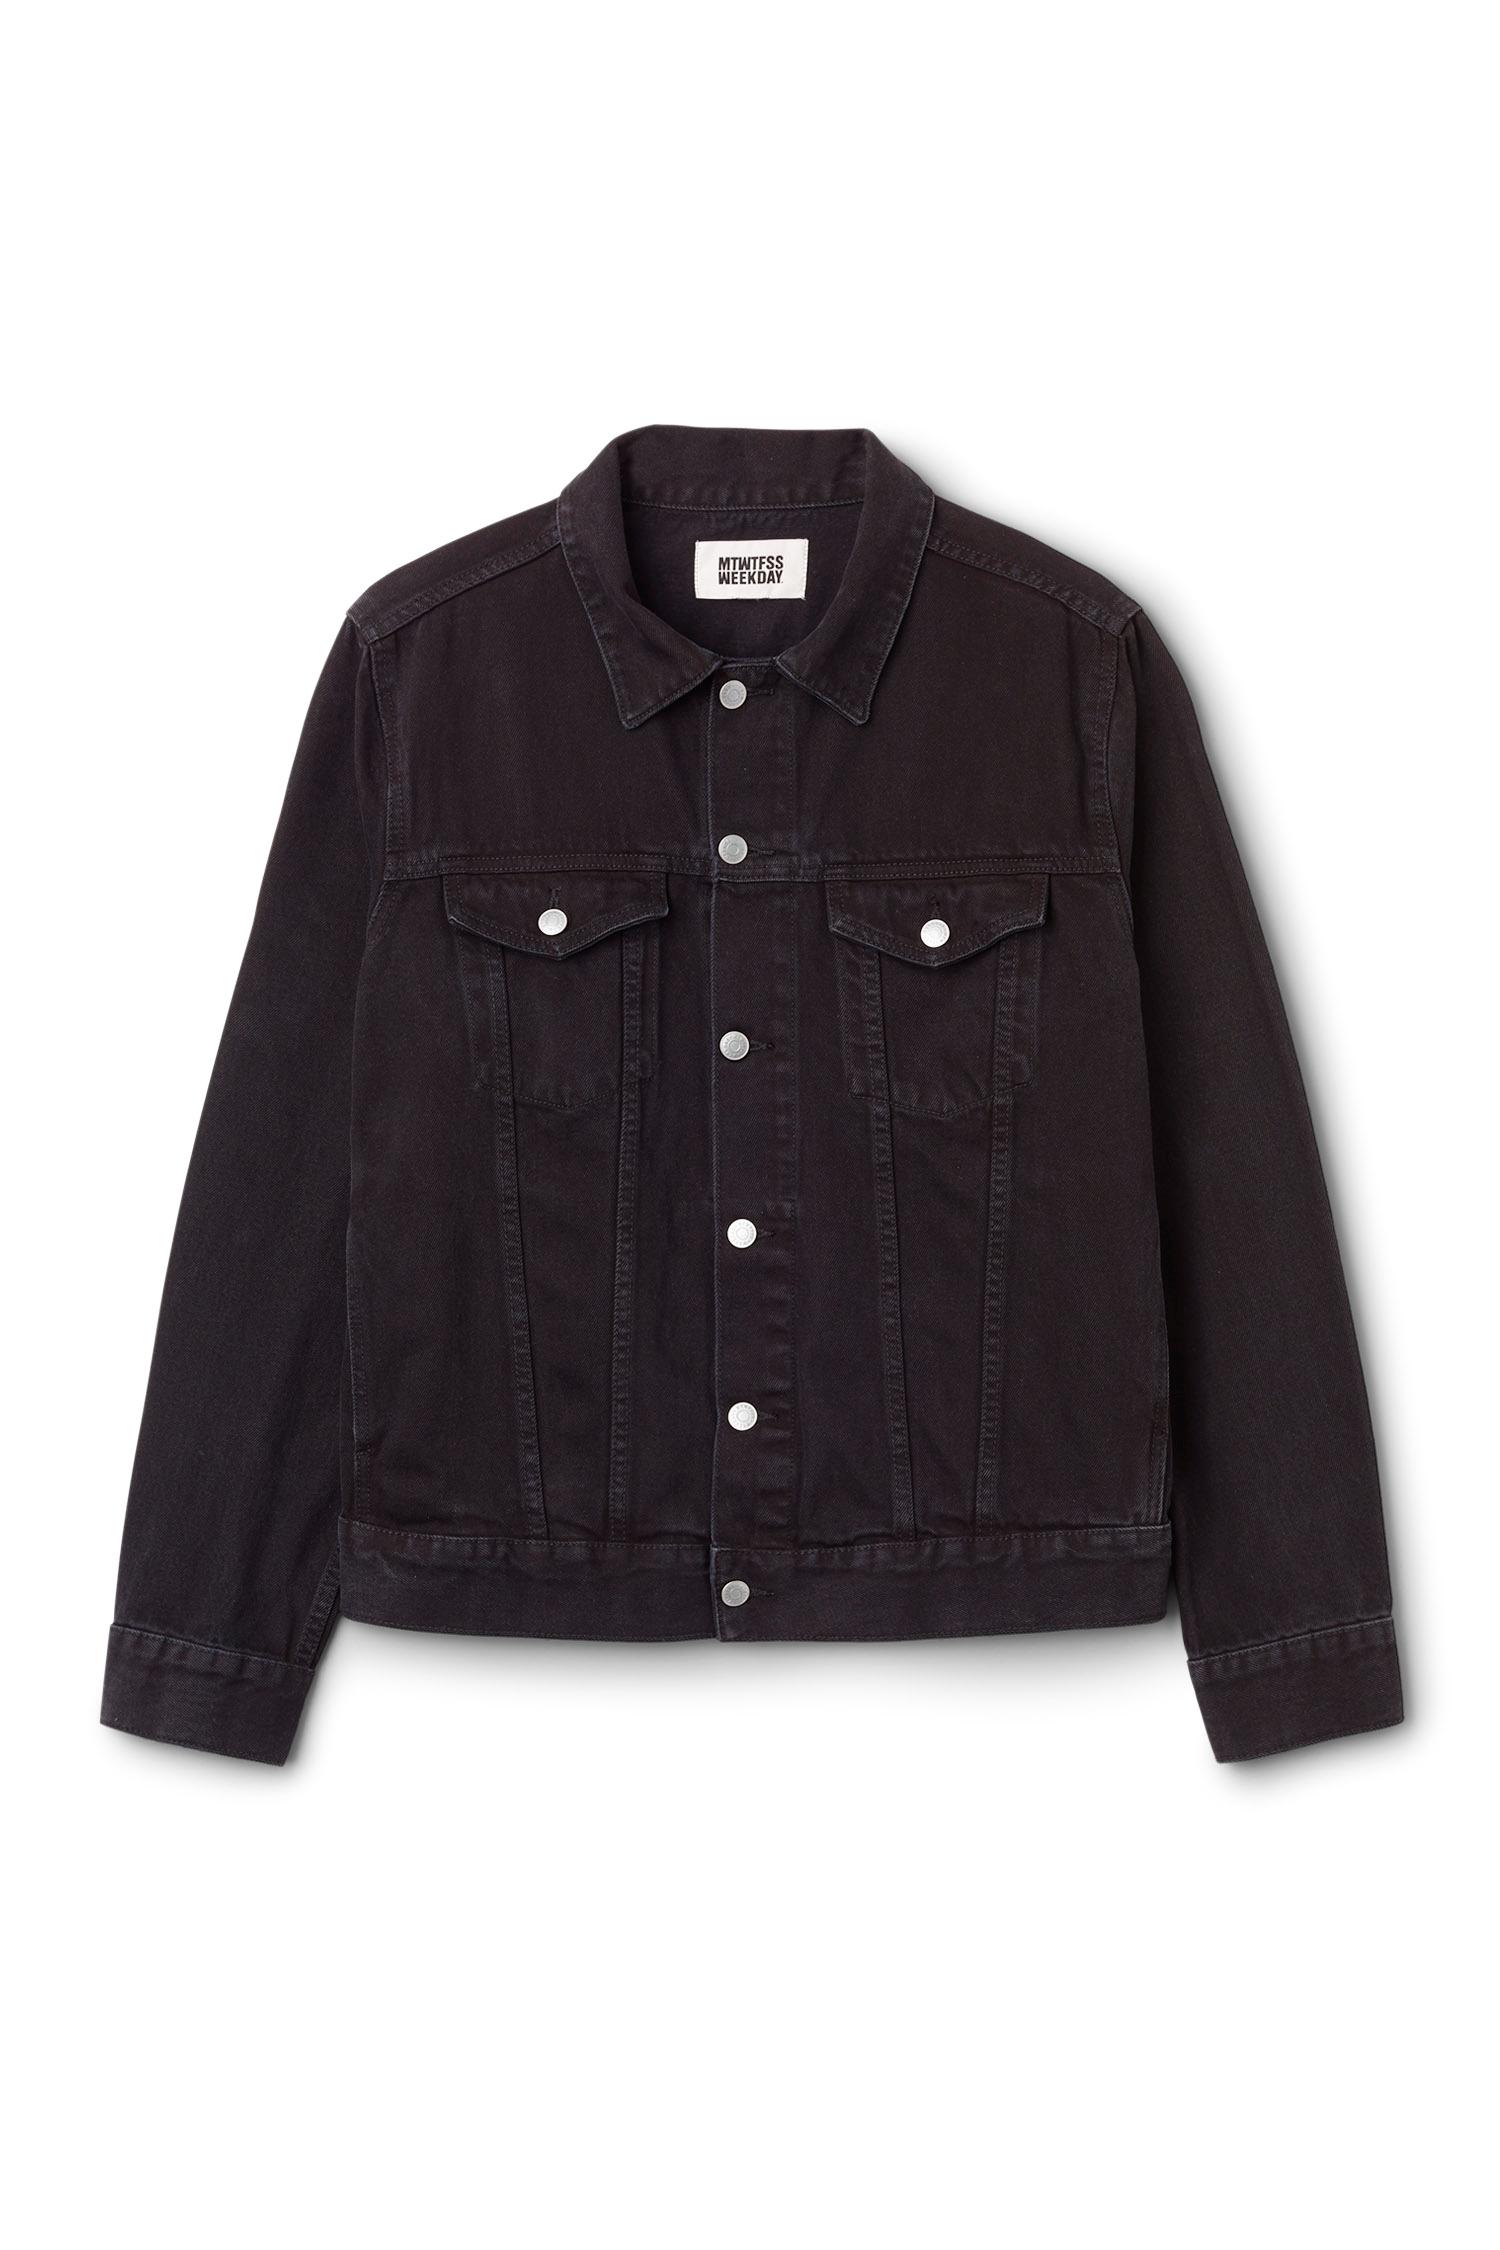 Weekday Denim Jacket